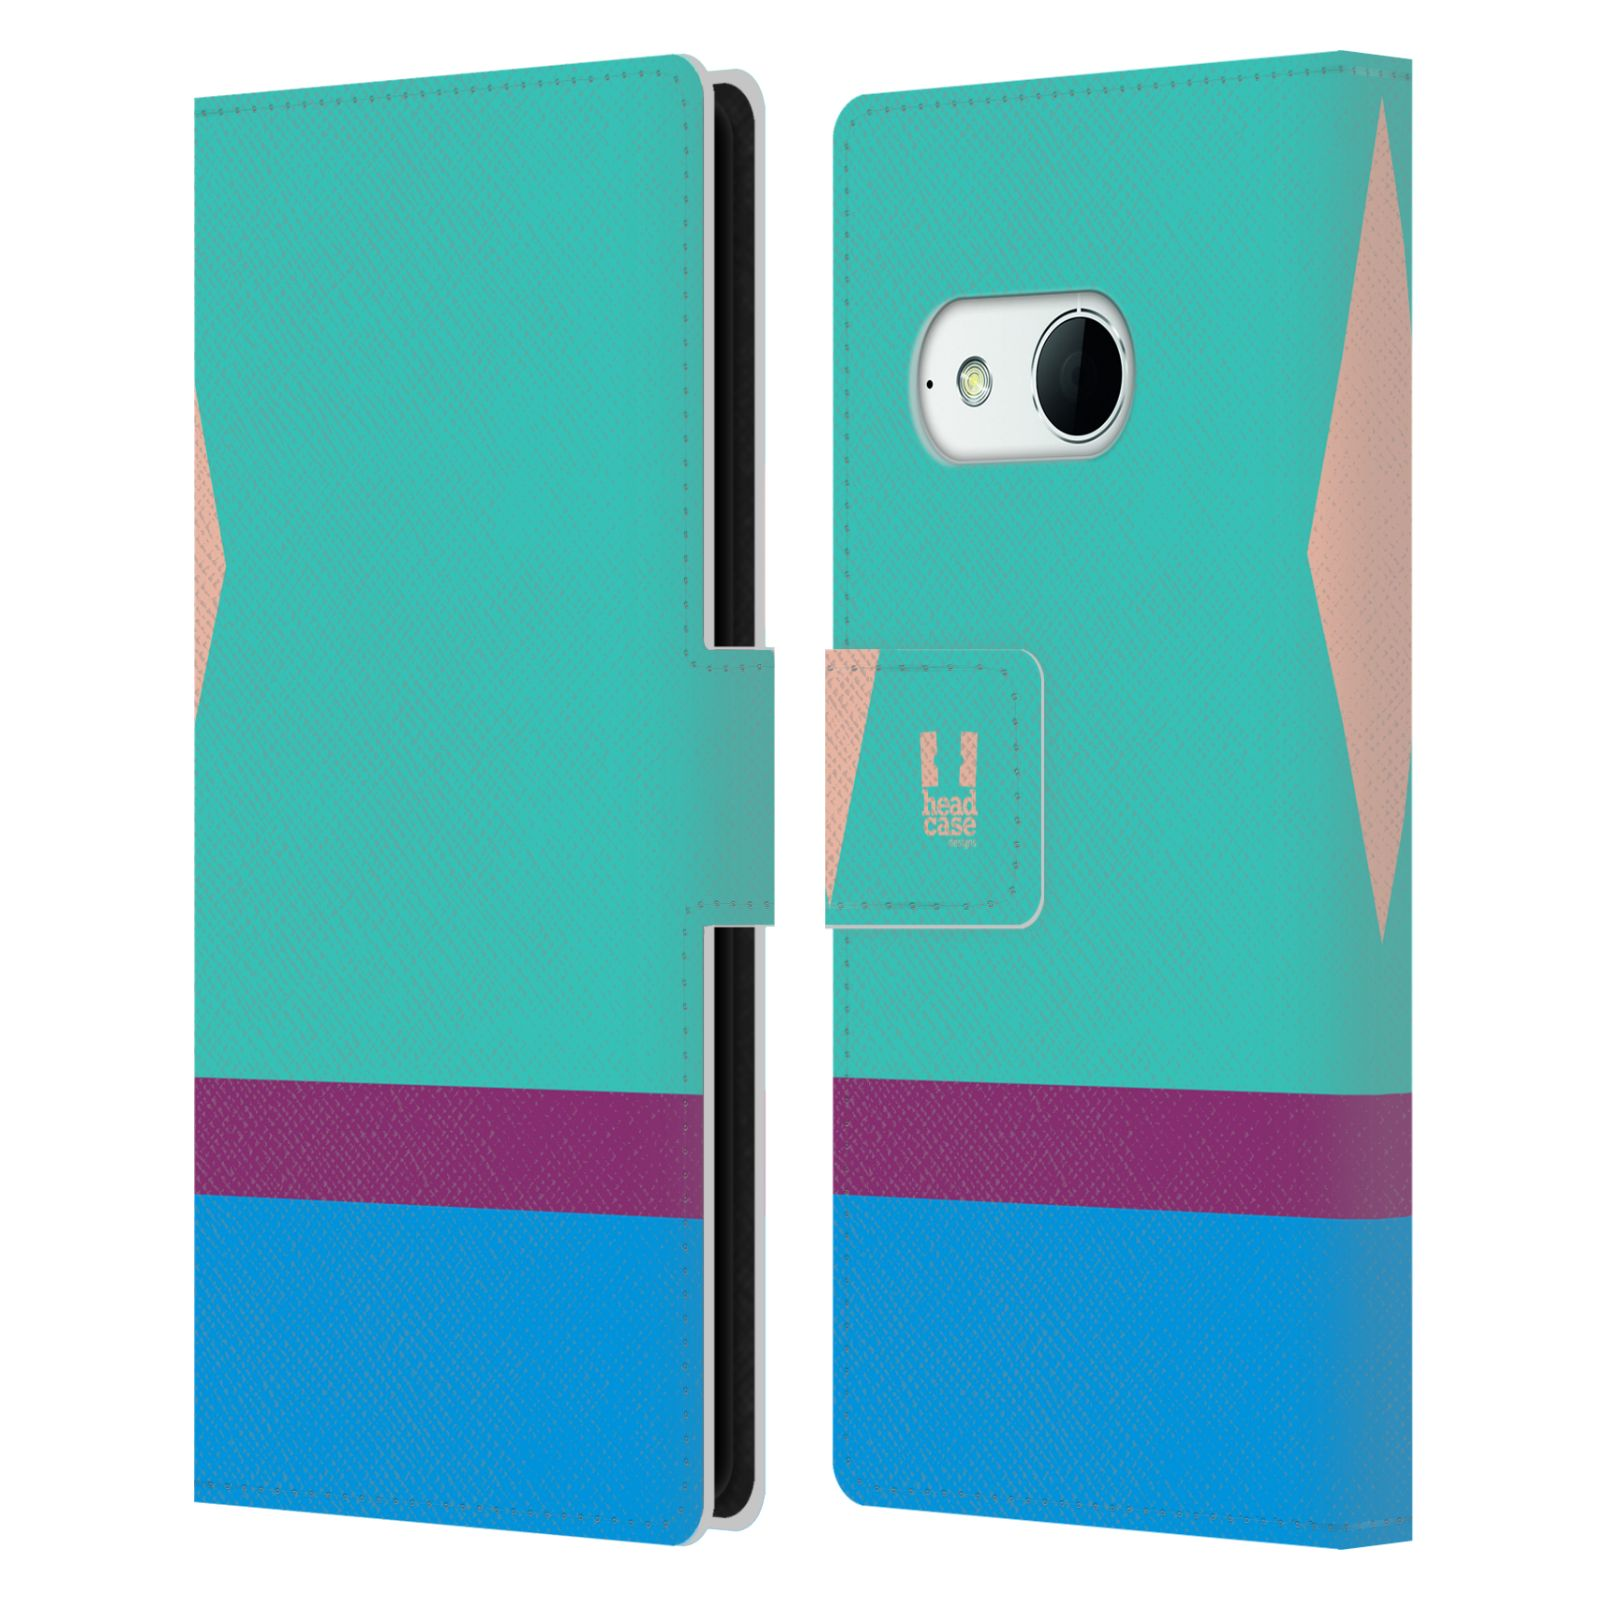 HEAD CASE Flipové pouzdro pro mobil HTC ONE MINI 2 barevné tvary modrá a fialový pruh